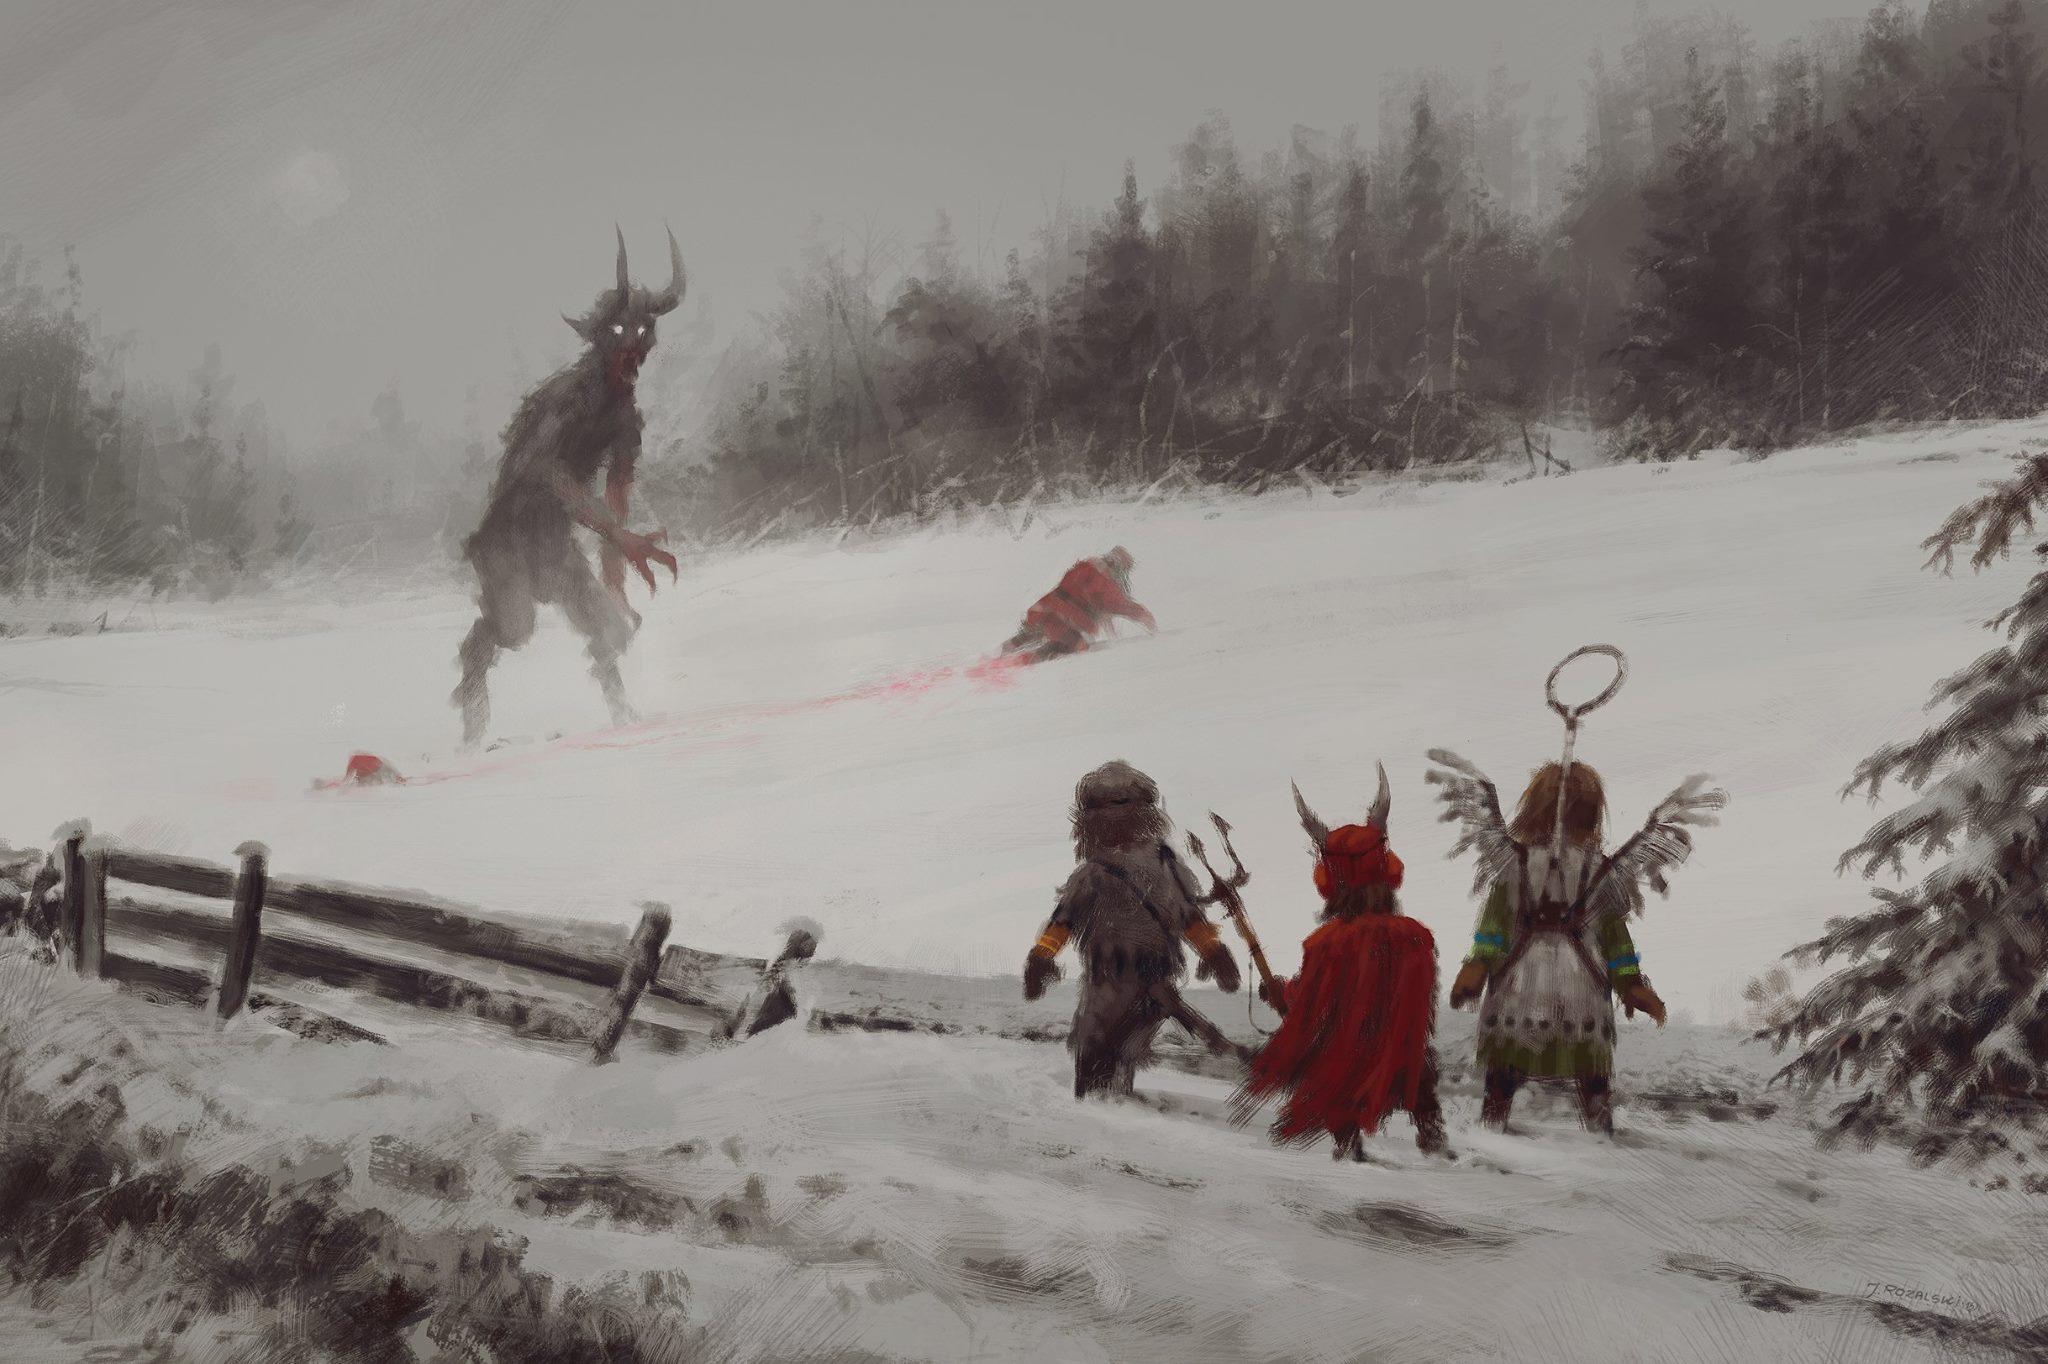 General 2048x1364 artwork landscape children costumes demon horror snow digital art Santa Claus blood Jakub Różalski winter Krampus